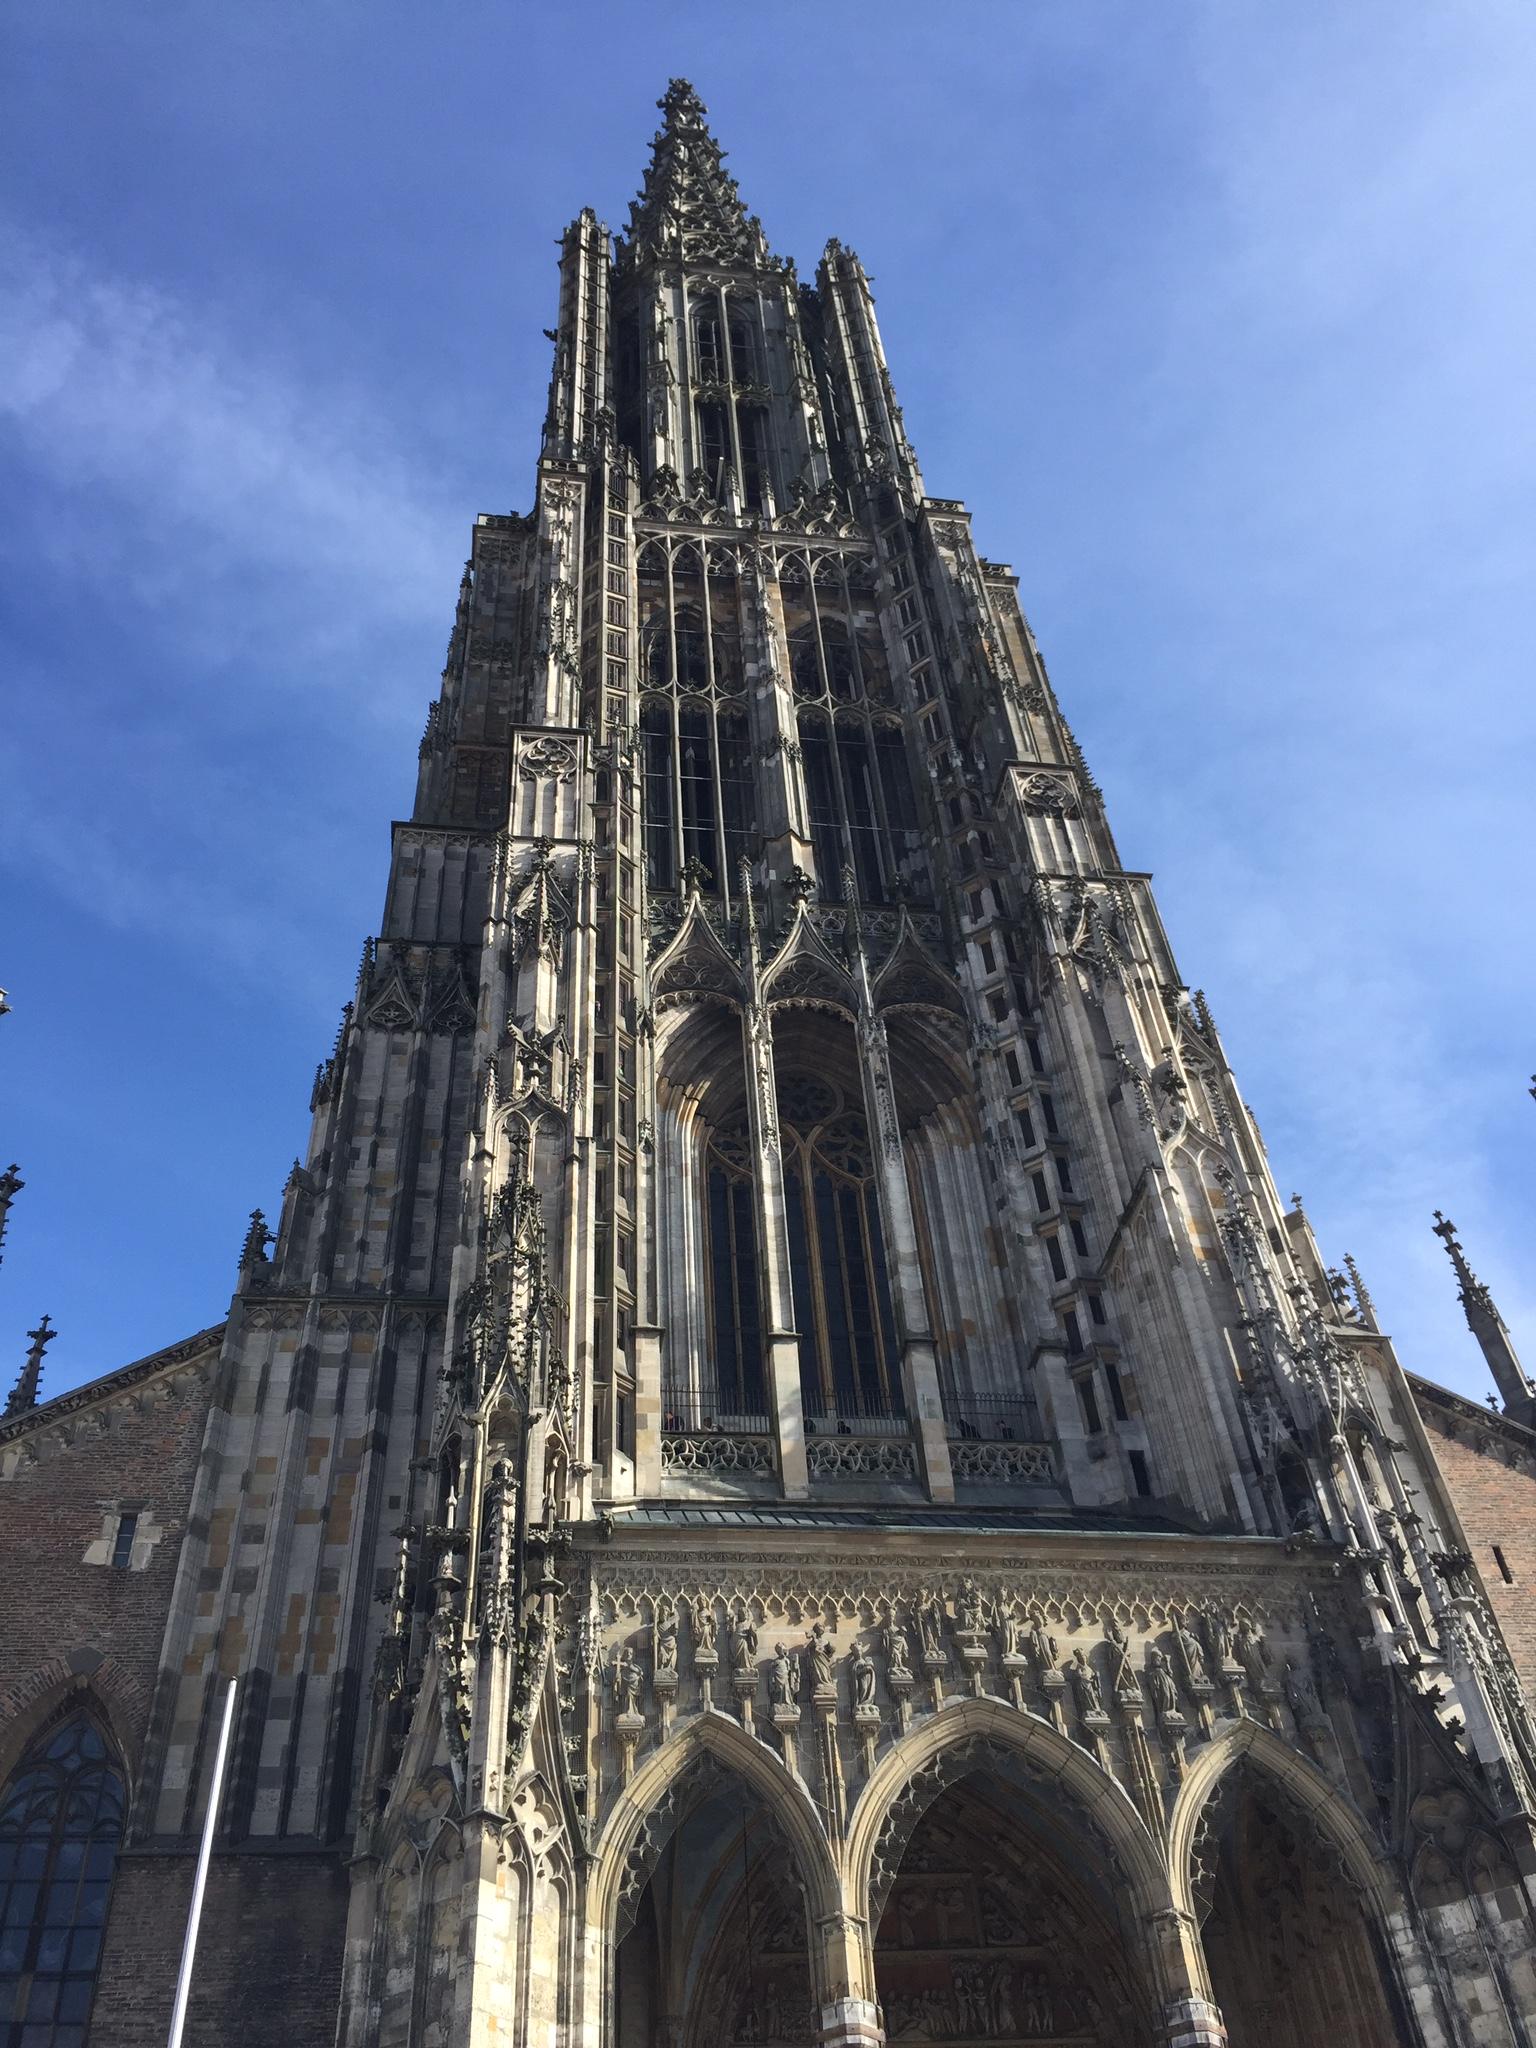 Highest Church tower in the world - Ulm